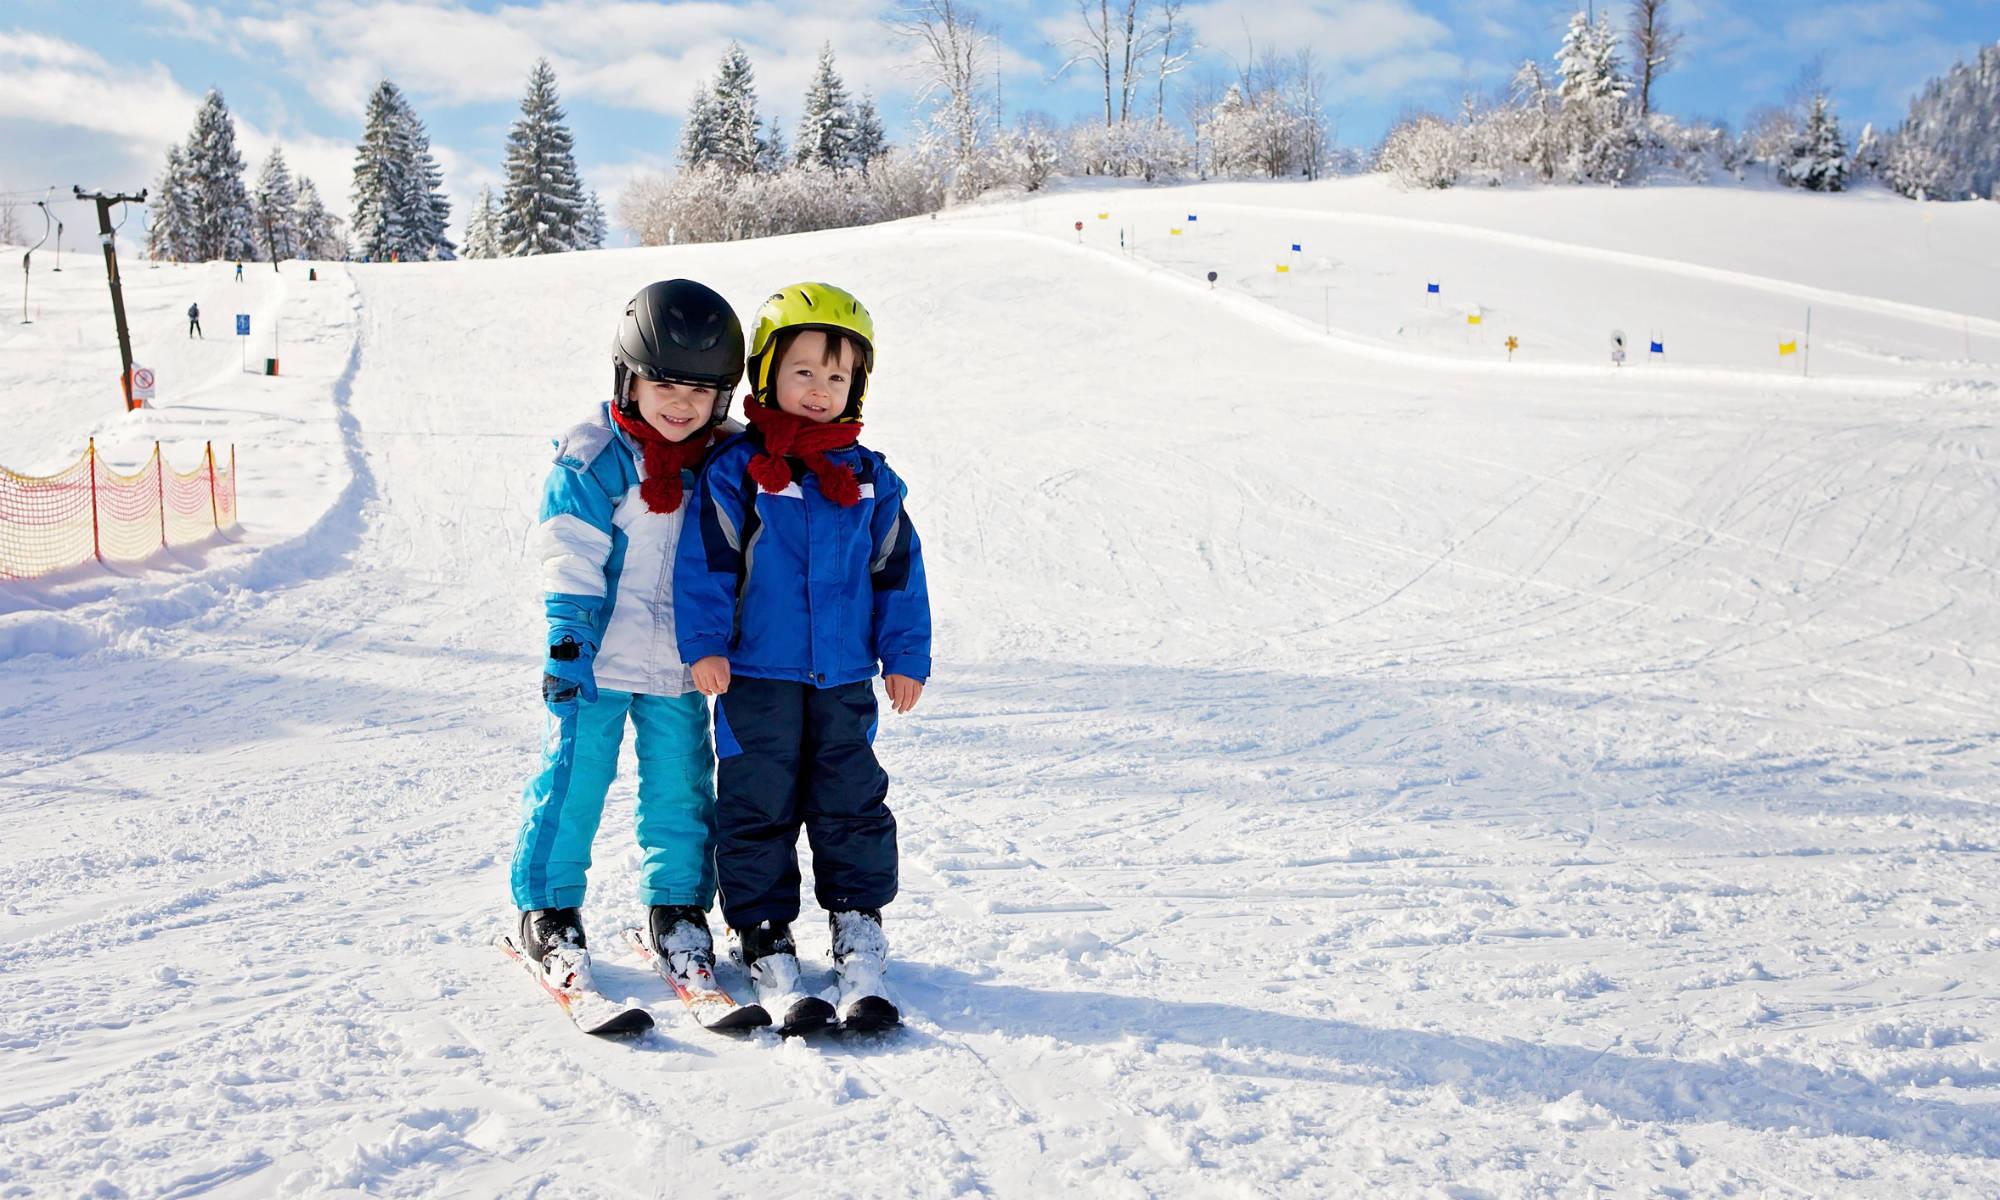 Premium ski and snowboard school in Morzine